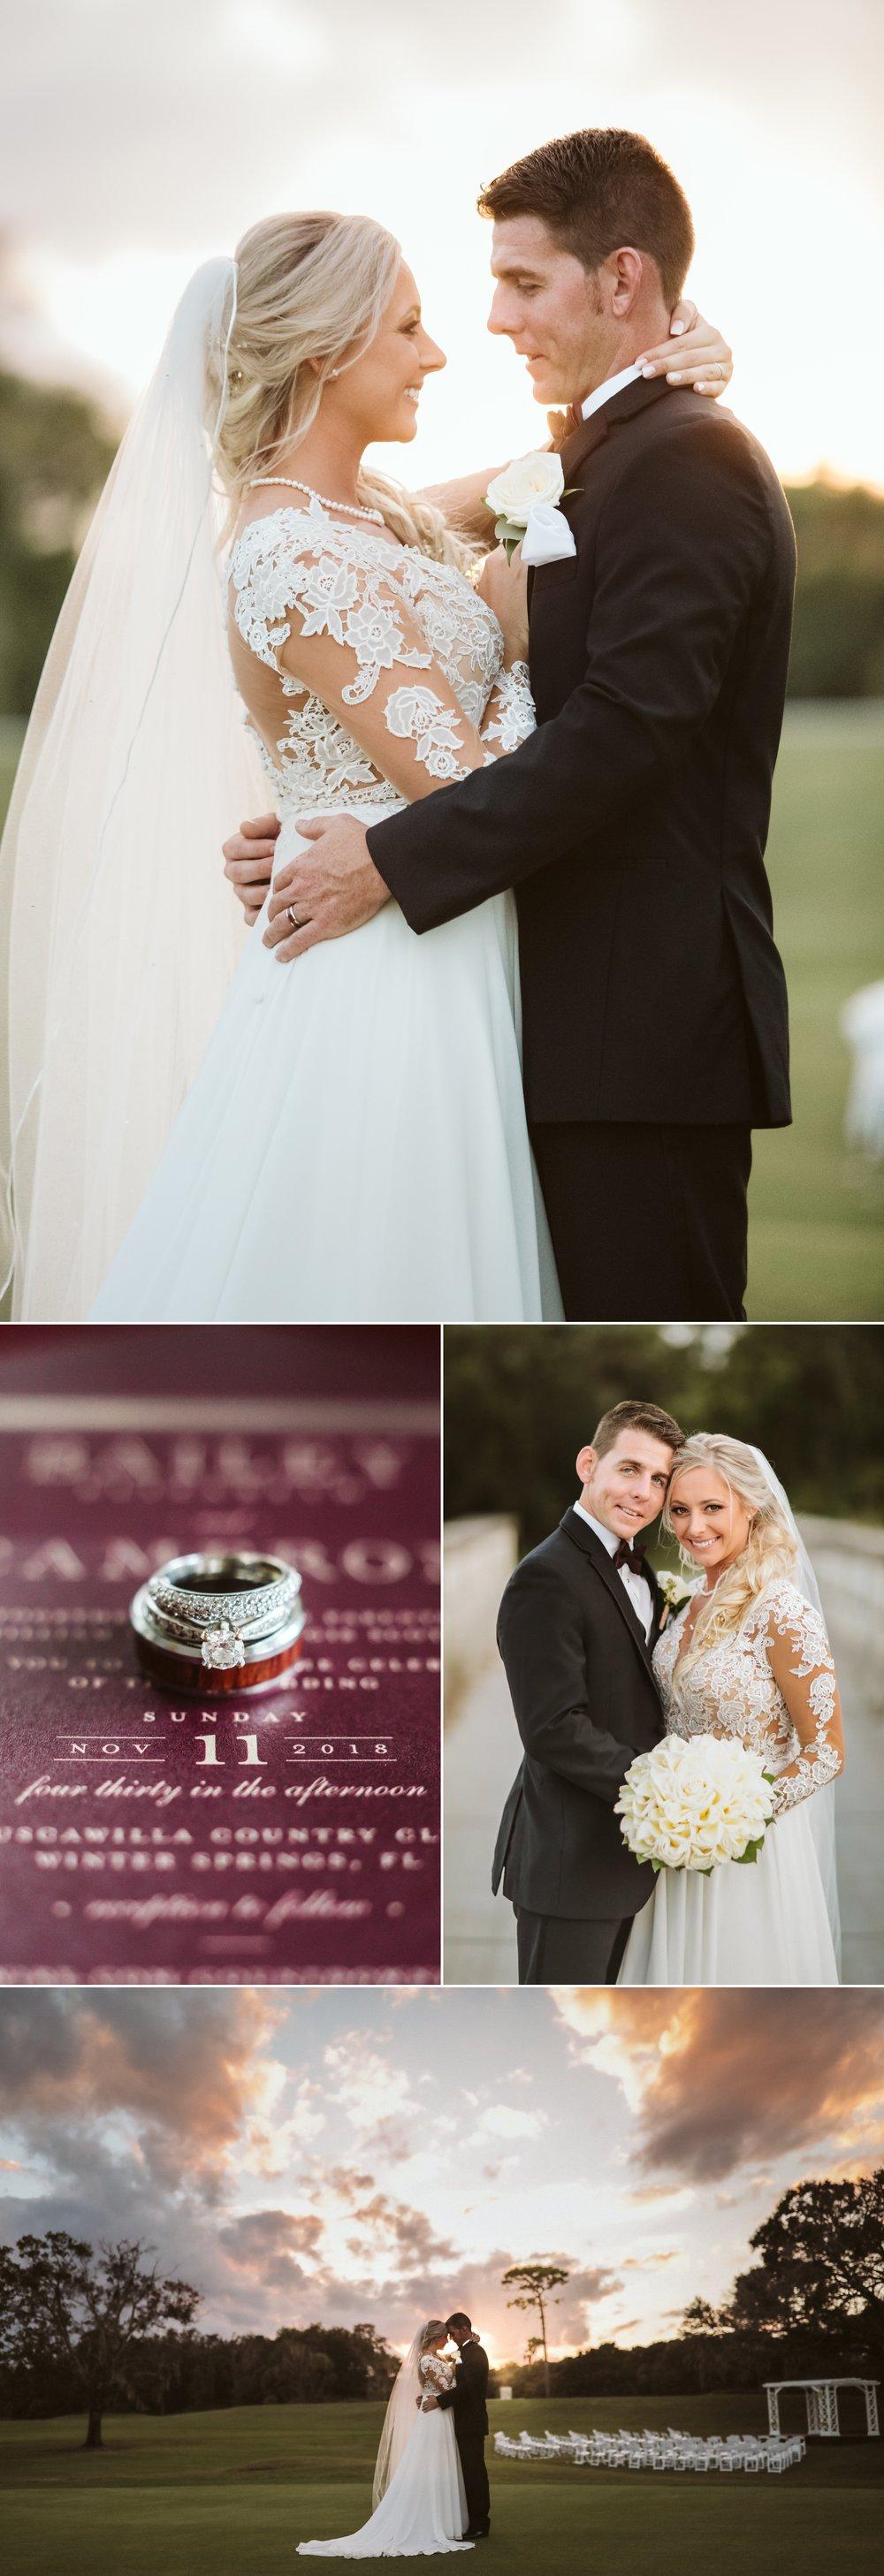 Romantic Black Tie Wedding Tuscawilla Country Club- Bailey + Cameron5.jpg